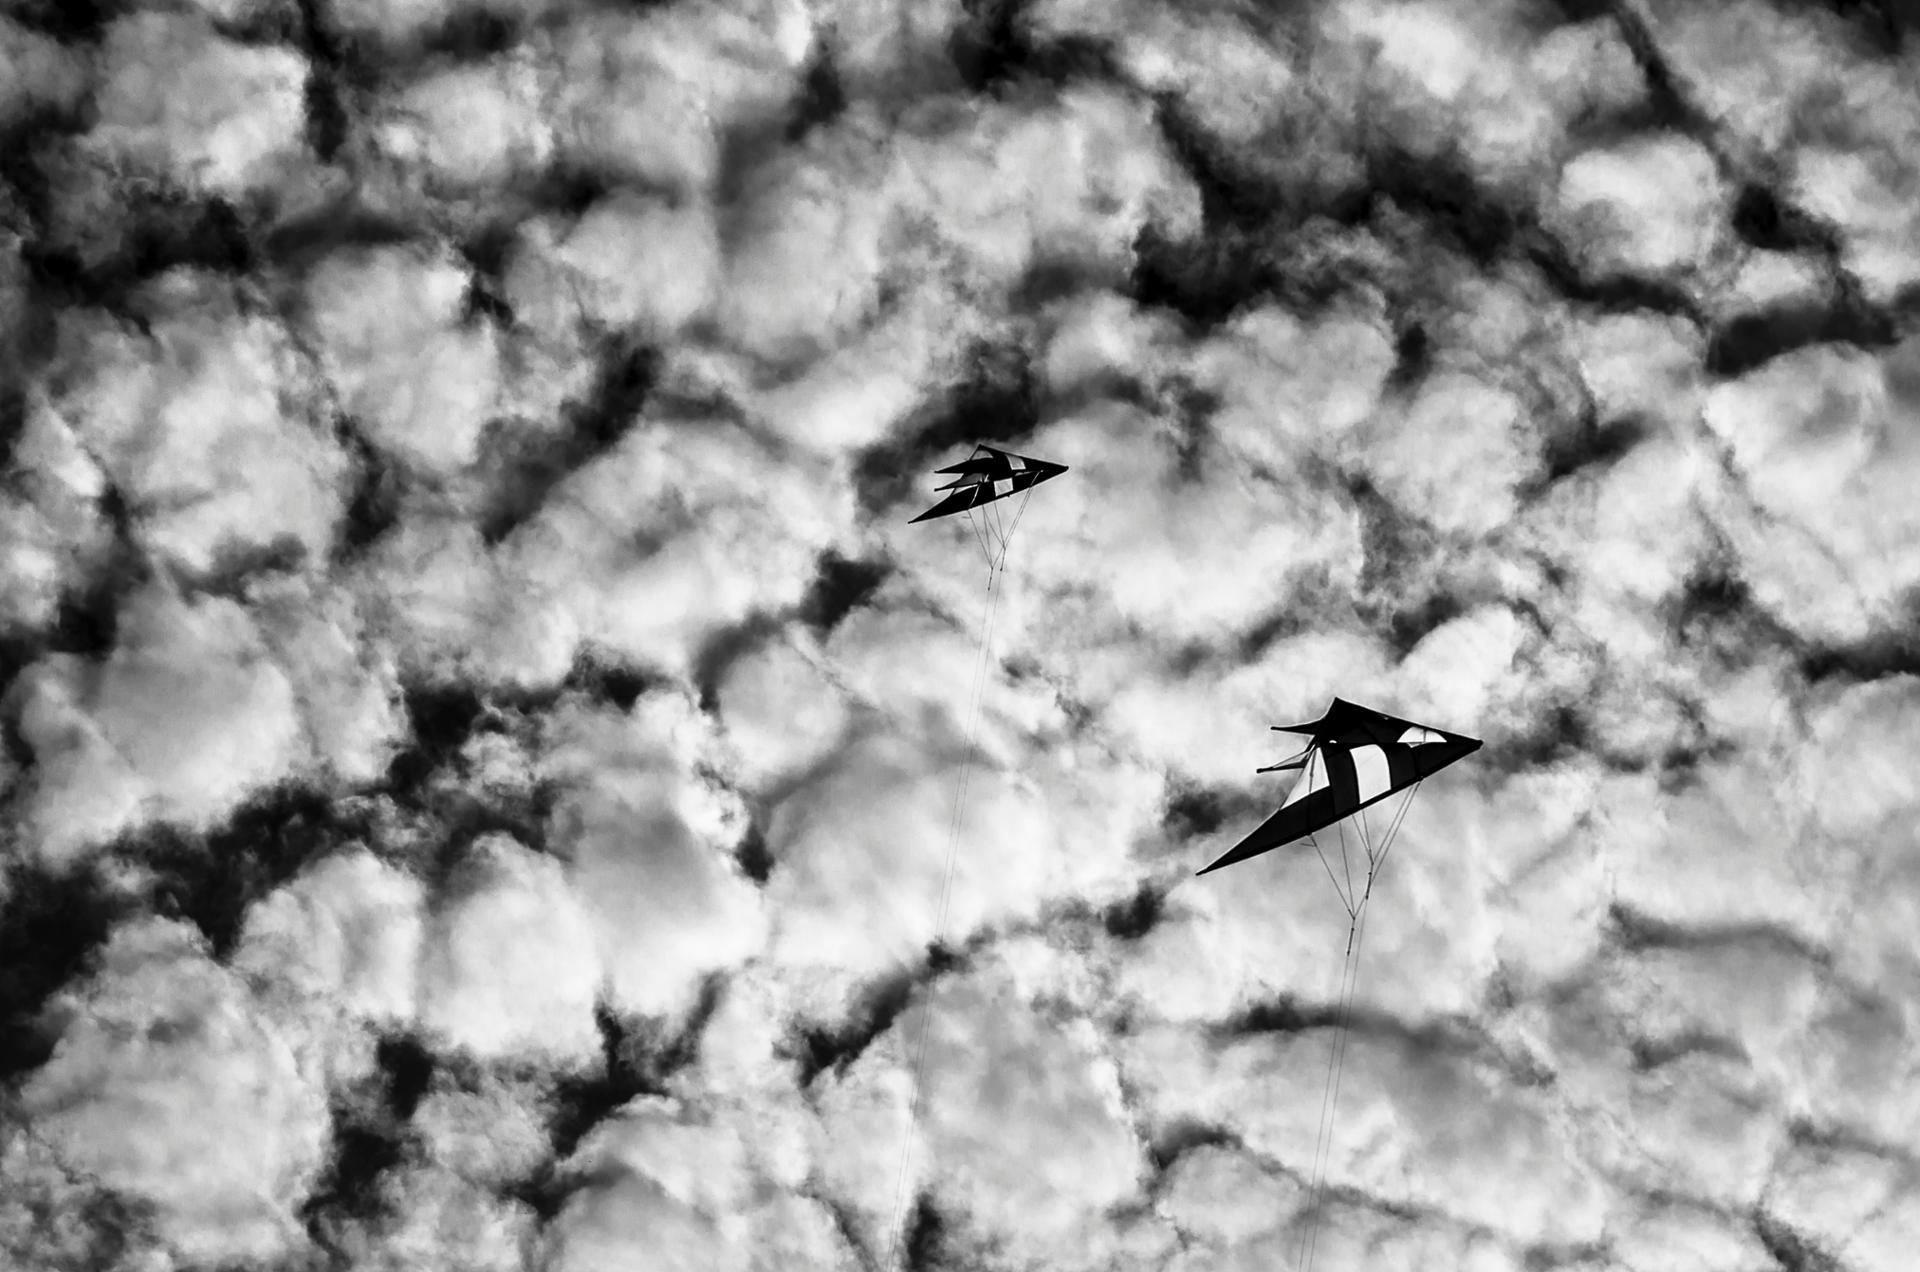 deux cerf-volant